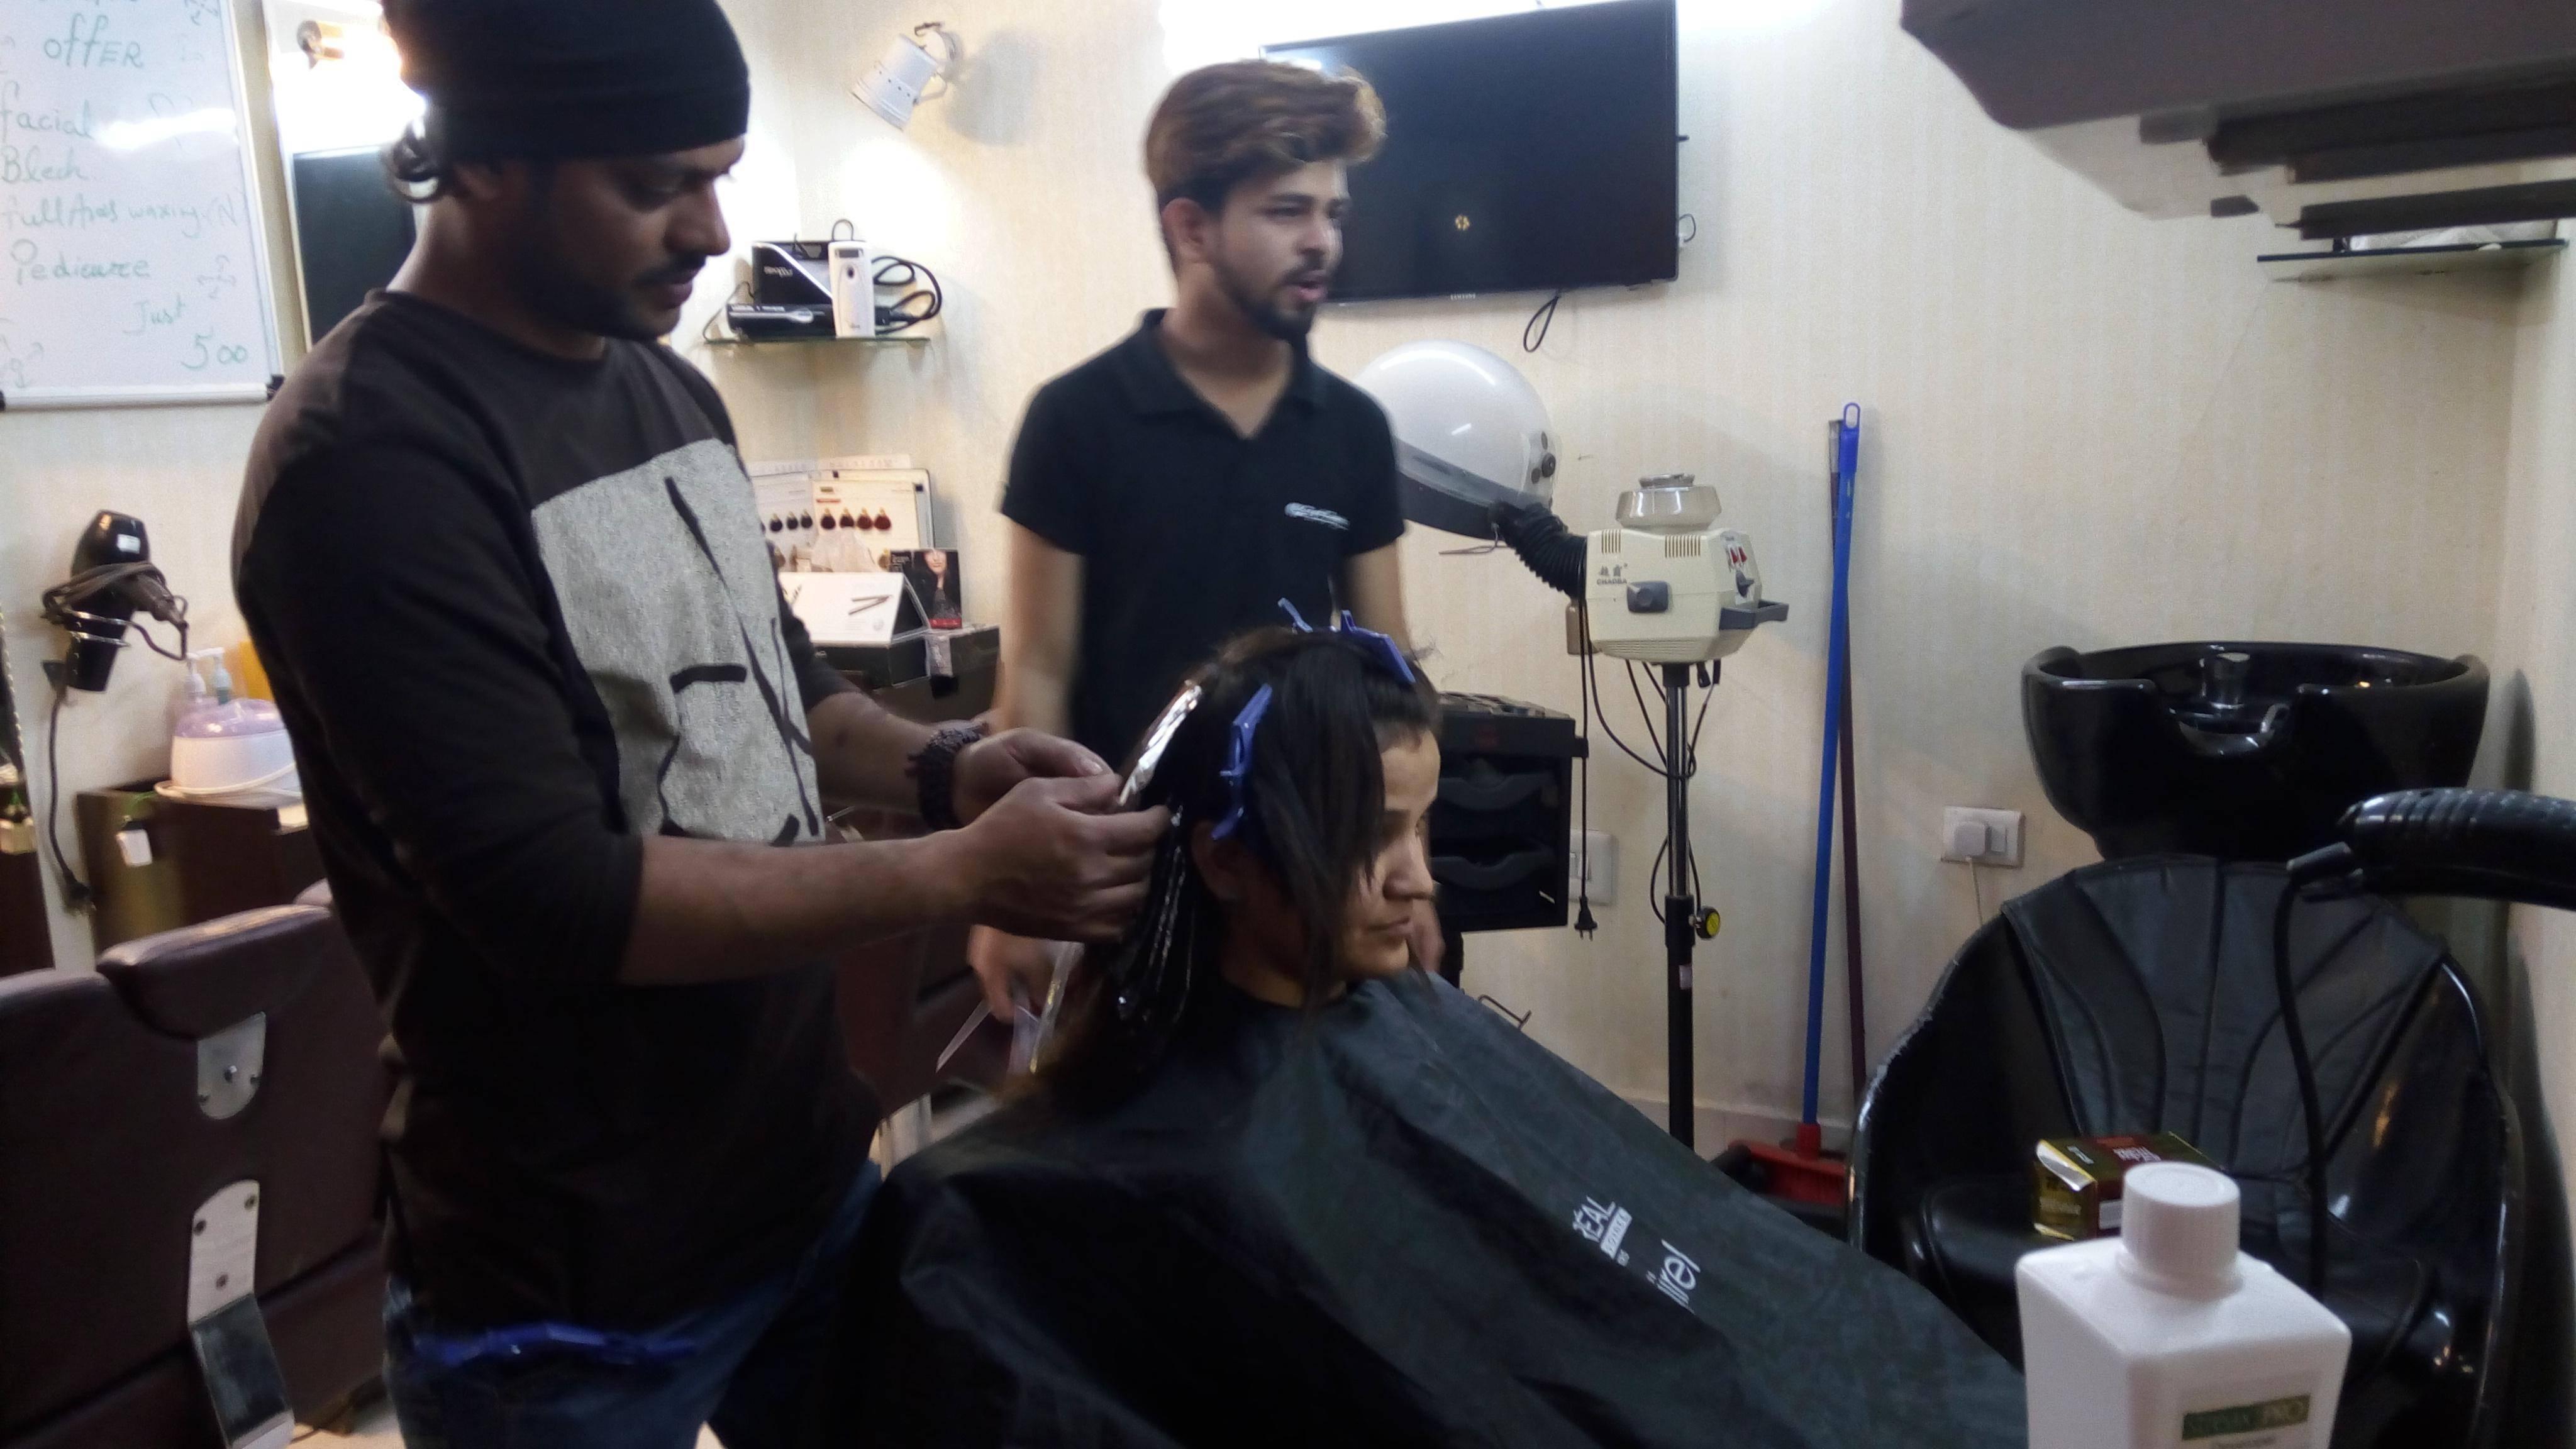 Good Looks Salon, Janakpuri - Women Beauty Parlours In Delhi - Justdial with regard to Best Haircut Salon In Janakpuri